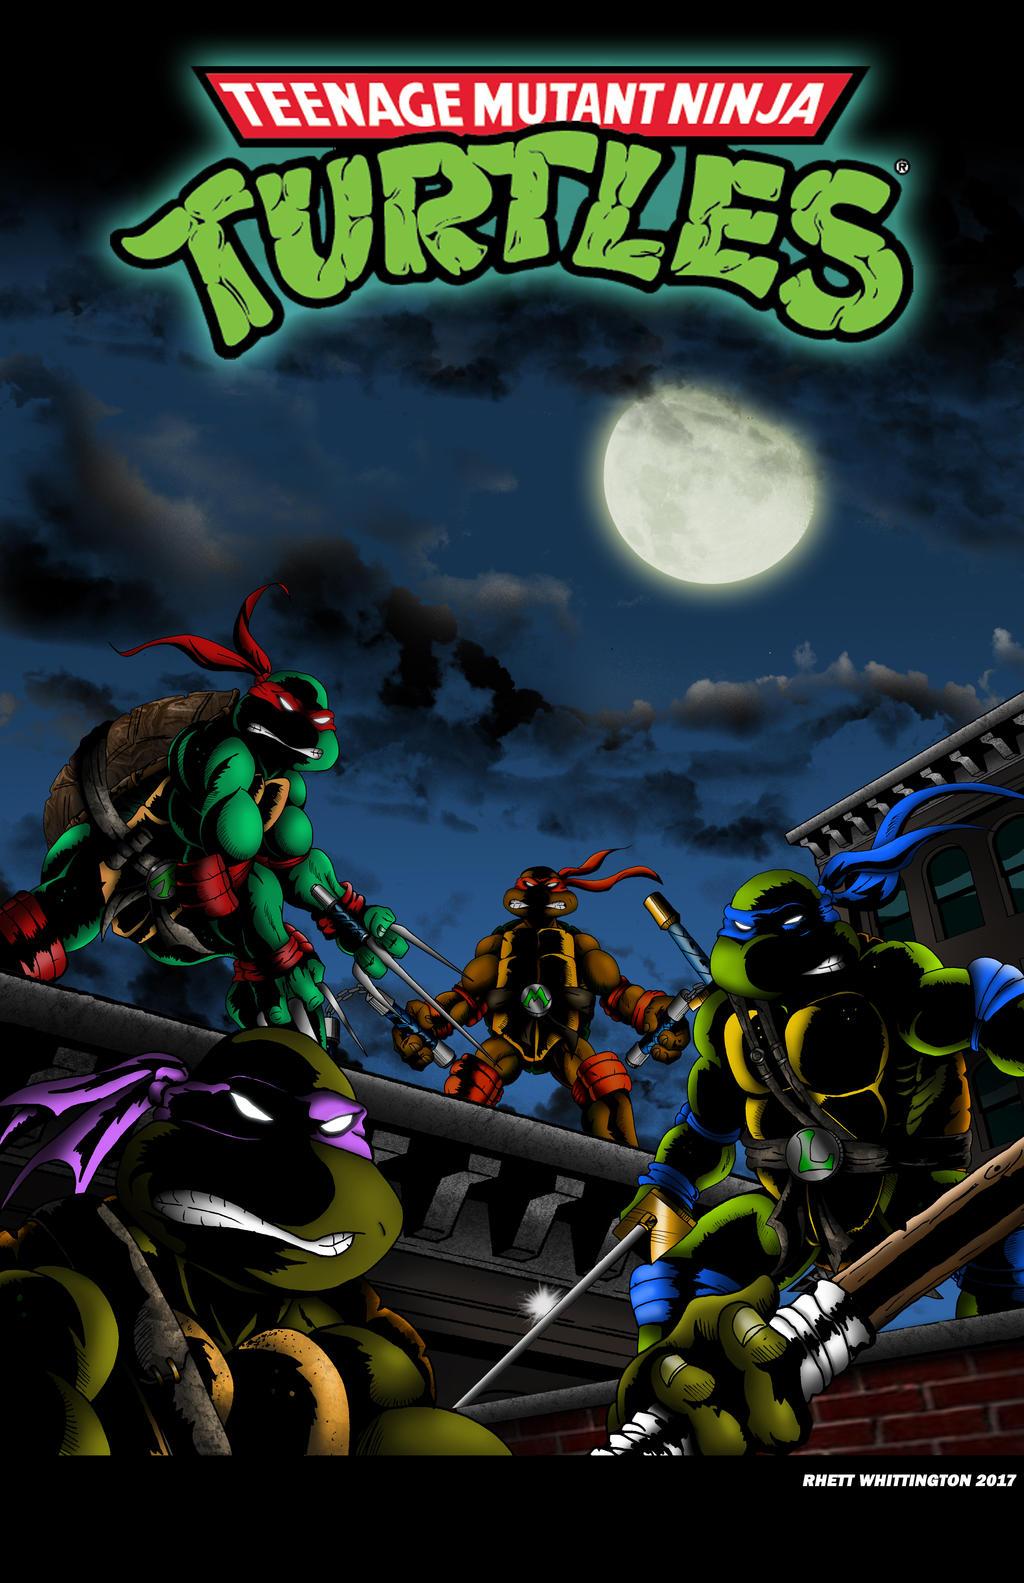 Teenage Mutant Ninja Turtles Cartoon Intro Poster by ...